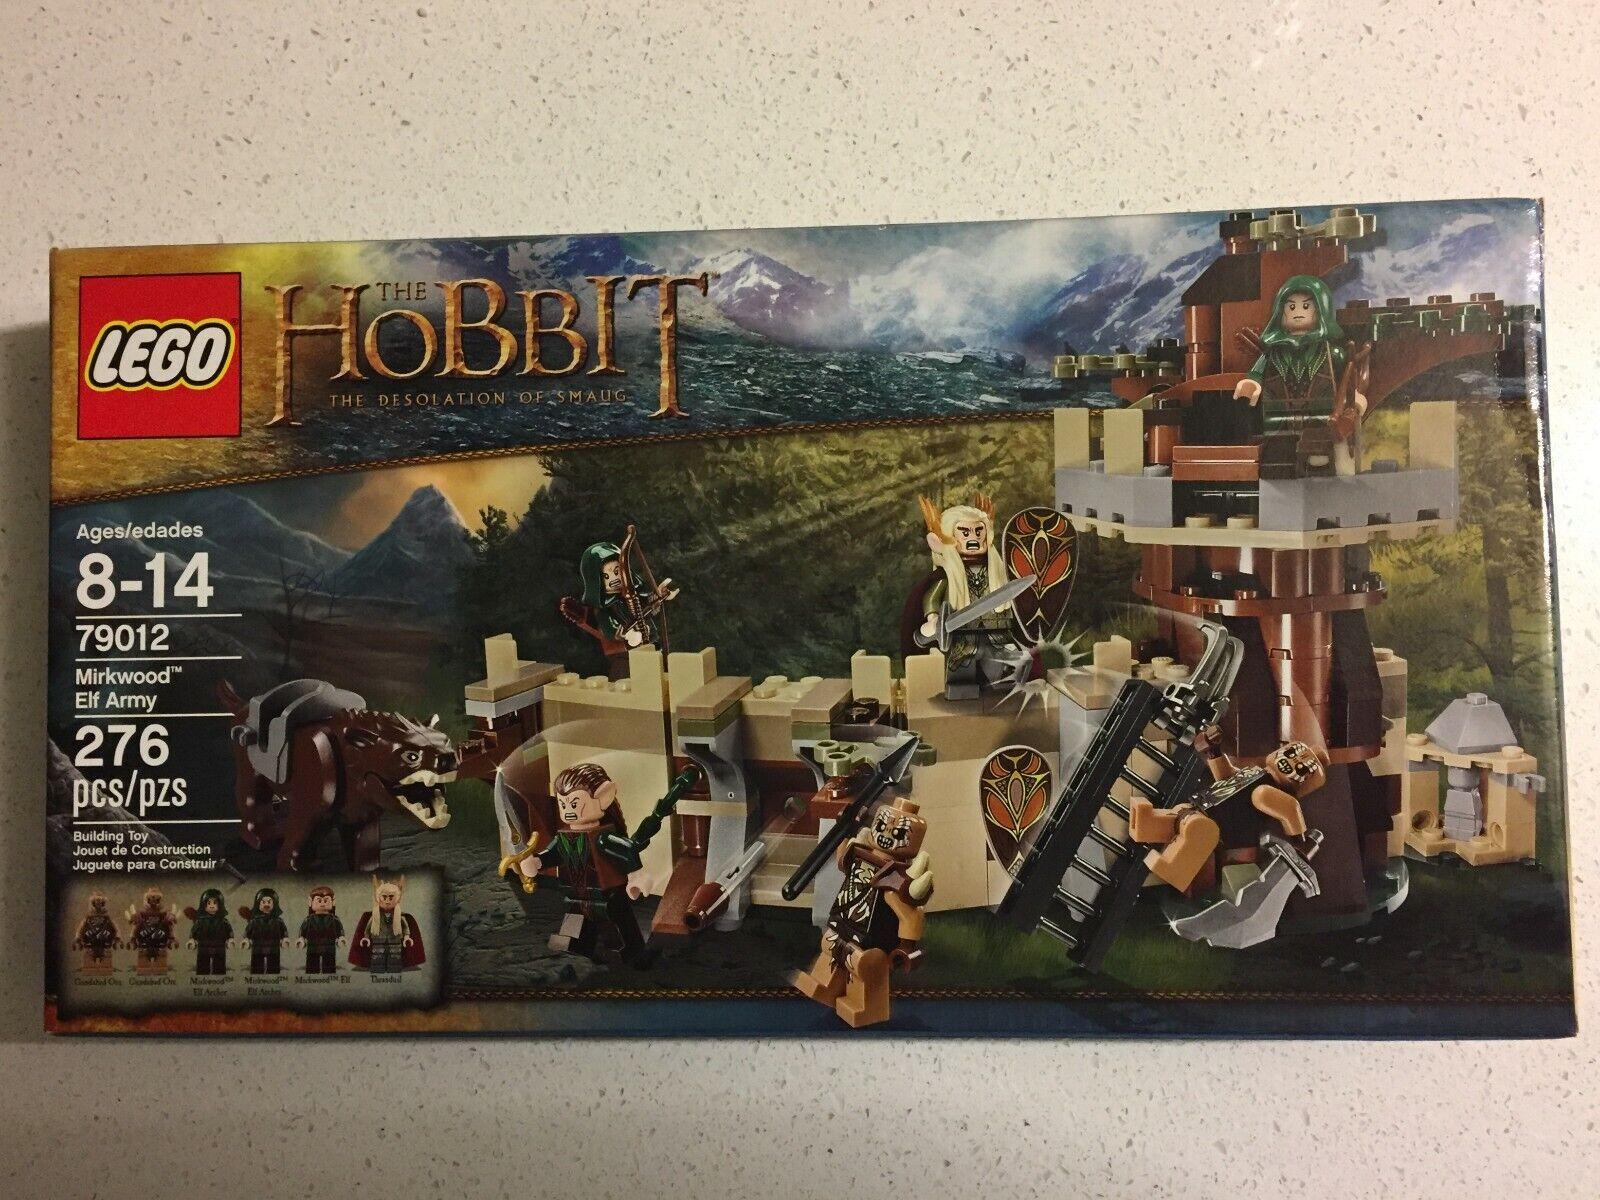 LEGO King Thranduil Mirkwood Elves 79012 Lord of the Rings Hobbit Elf Army NEW